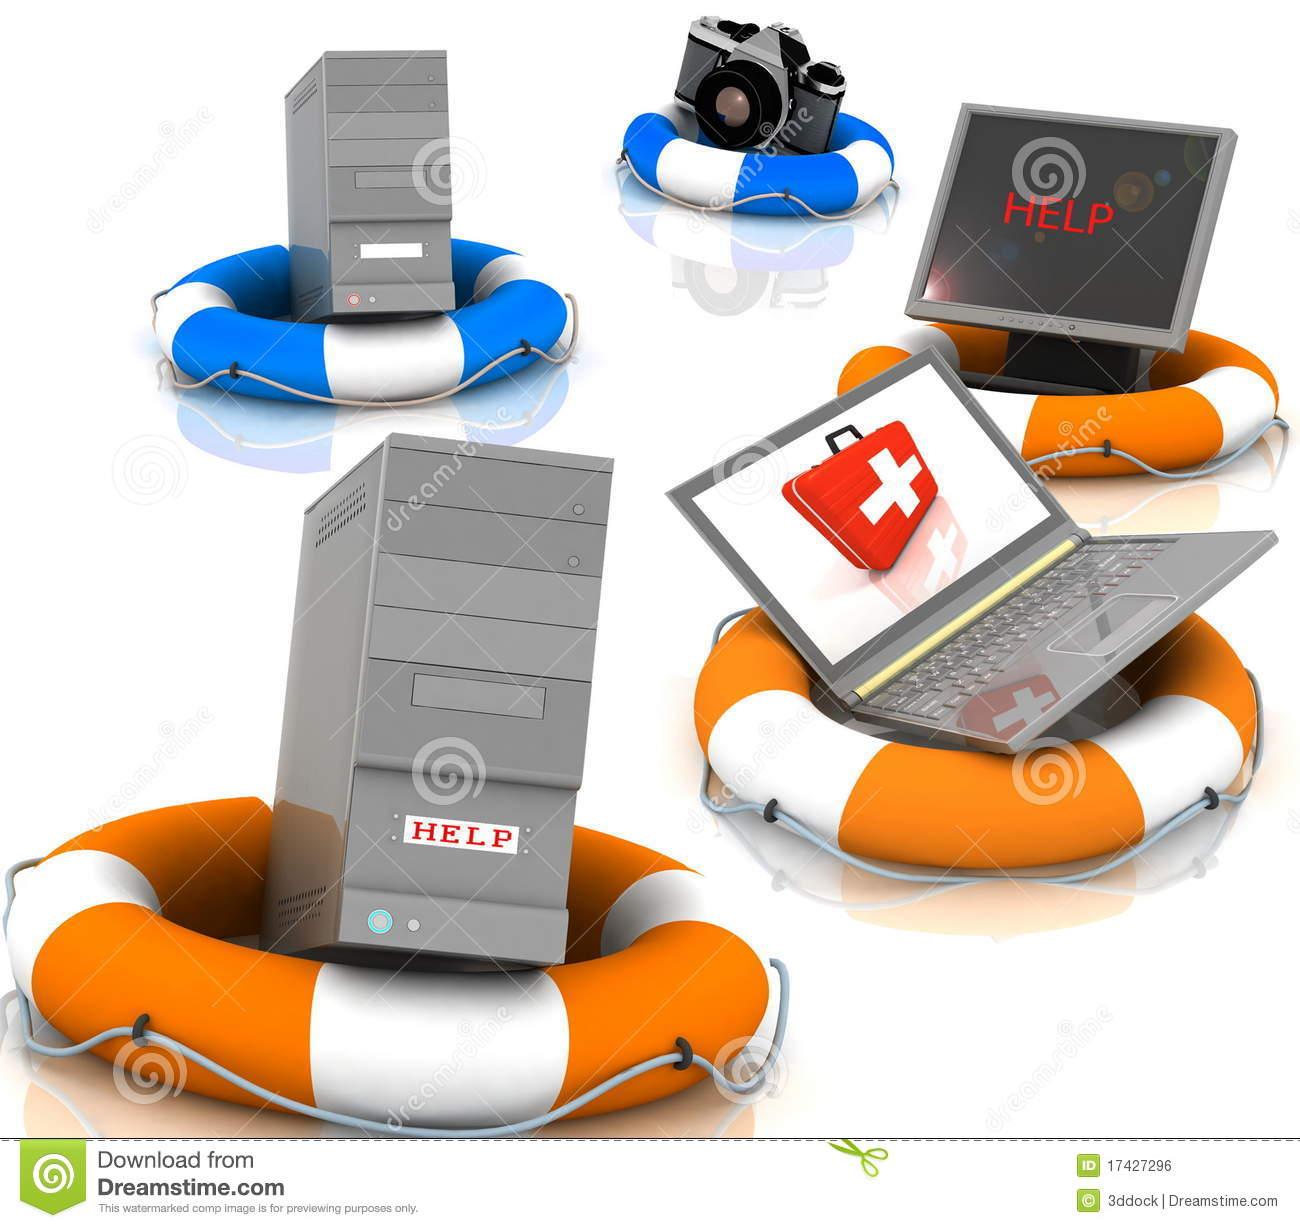 Free Lifesaver Stock-Photo